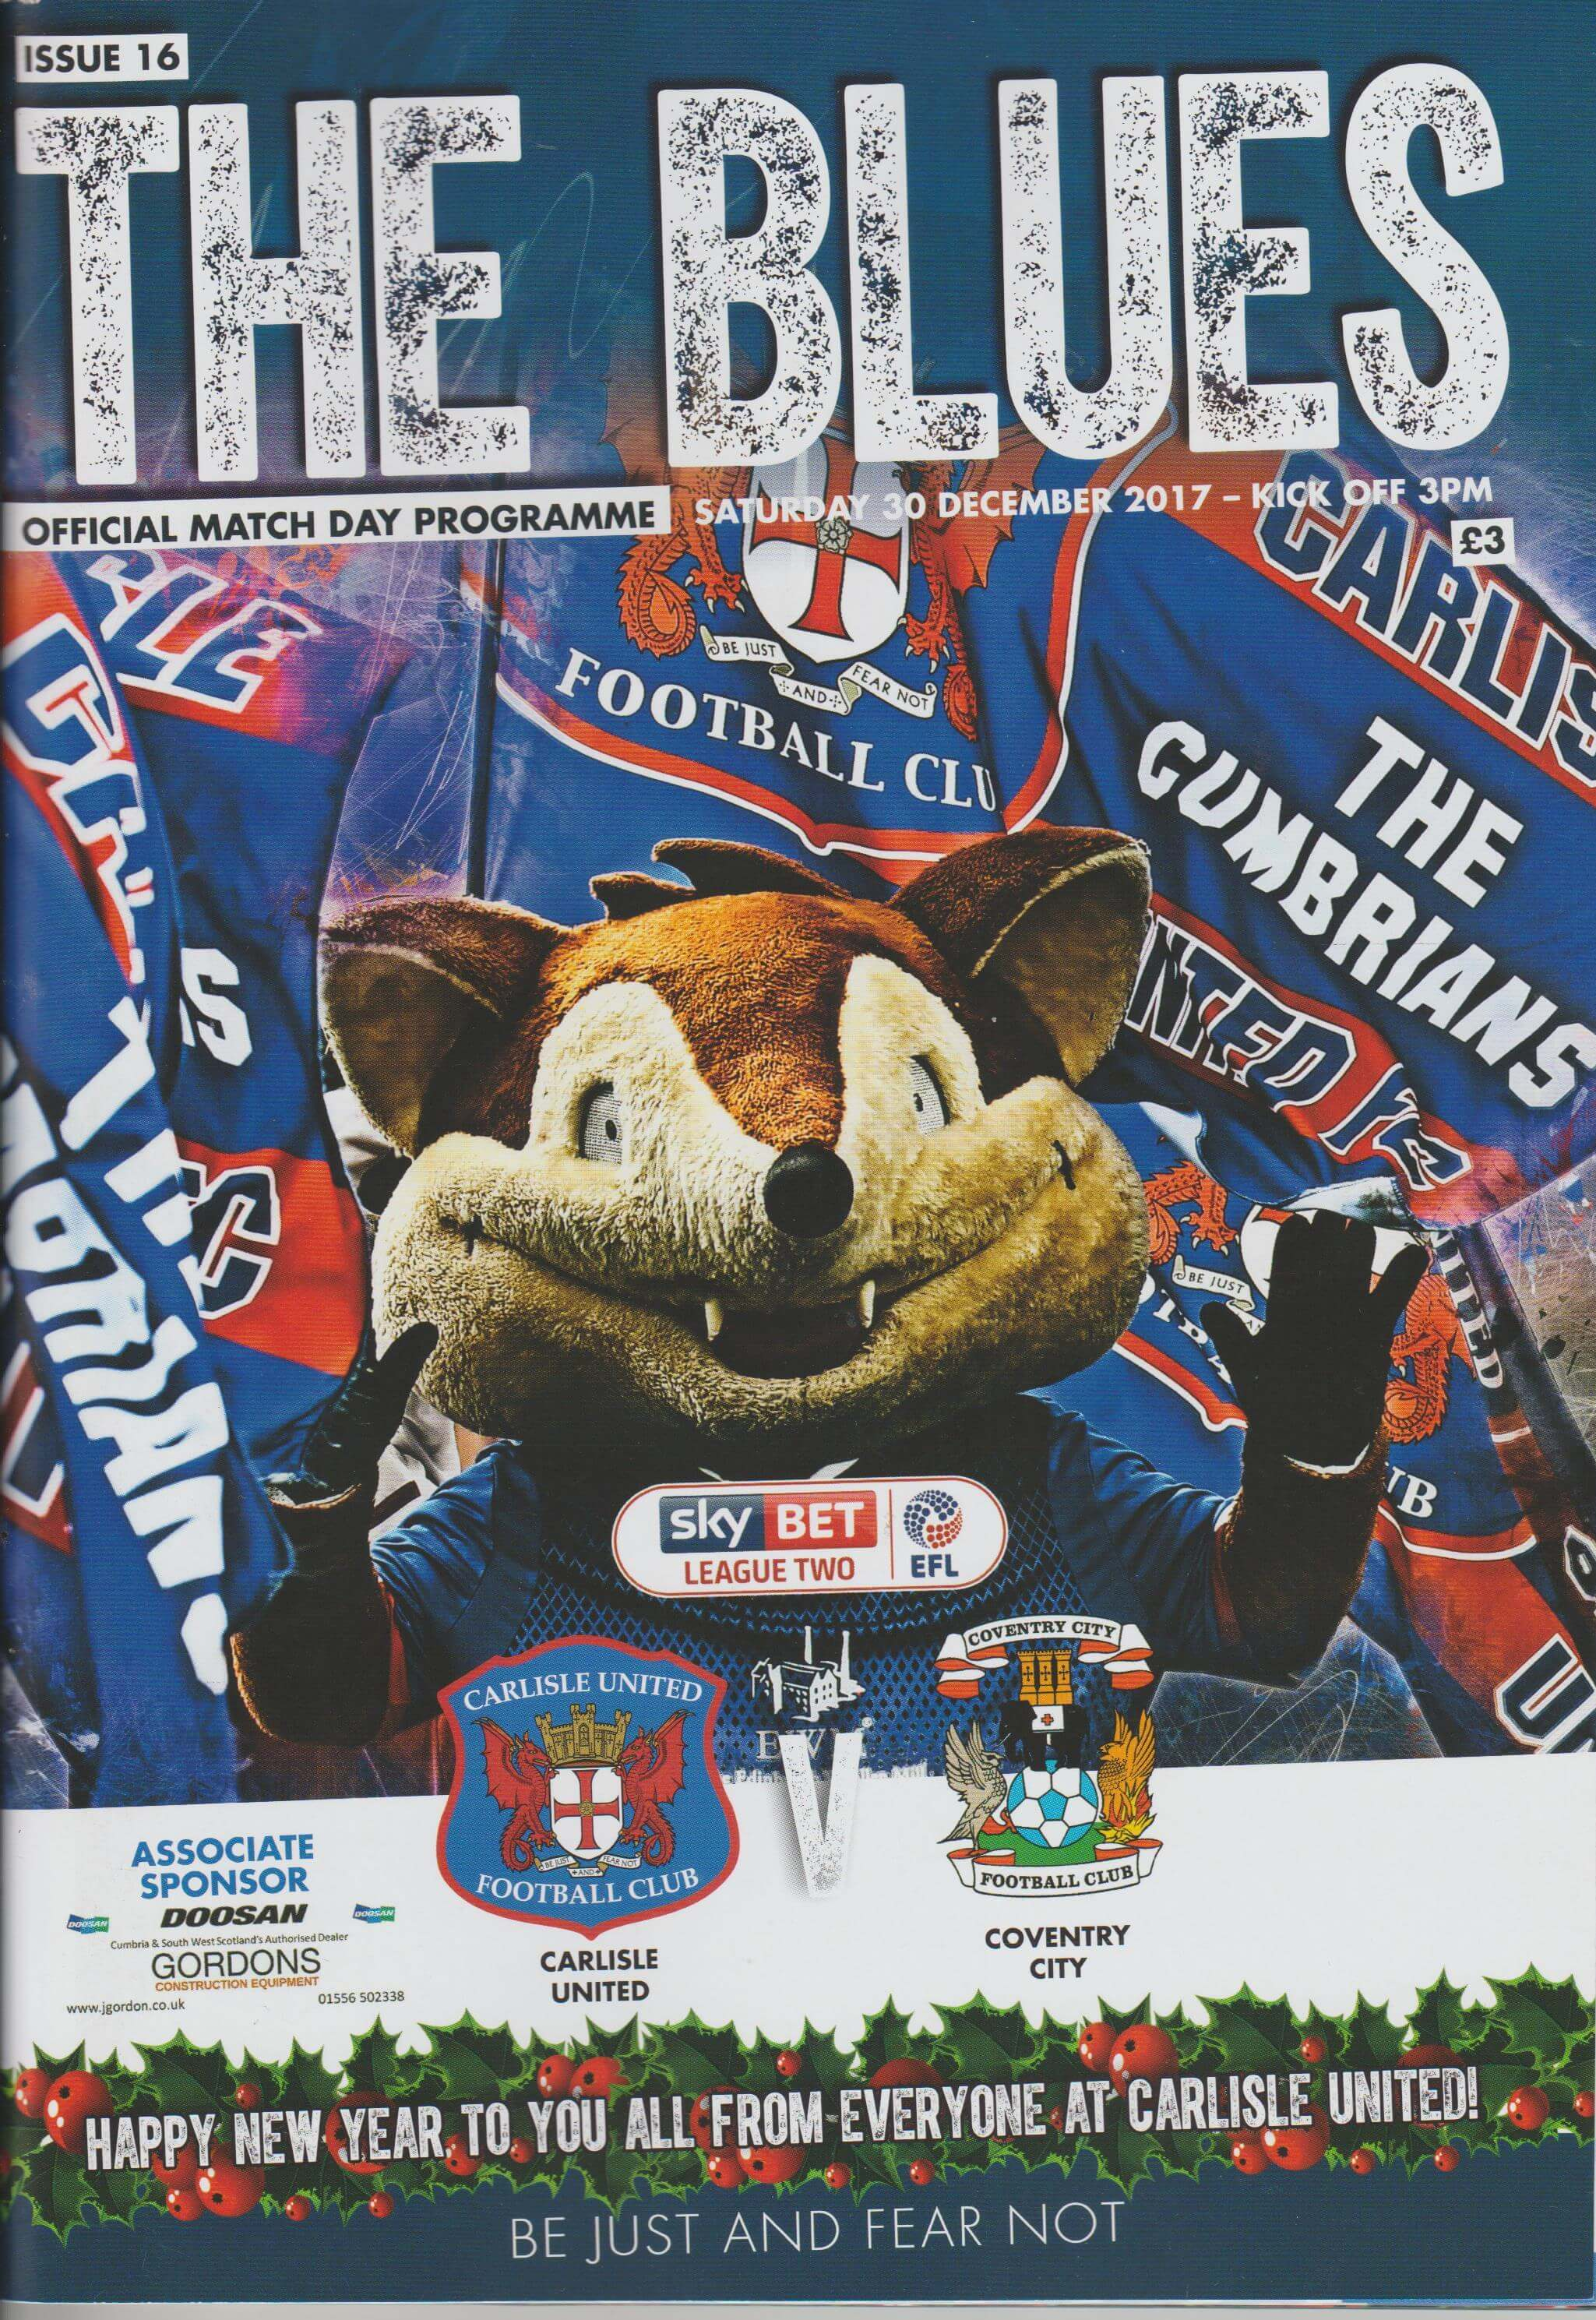 Carlisle United V Coventry City